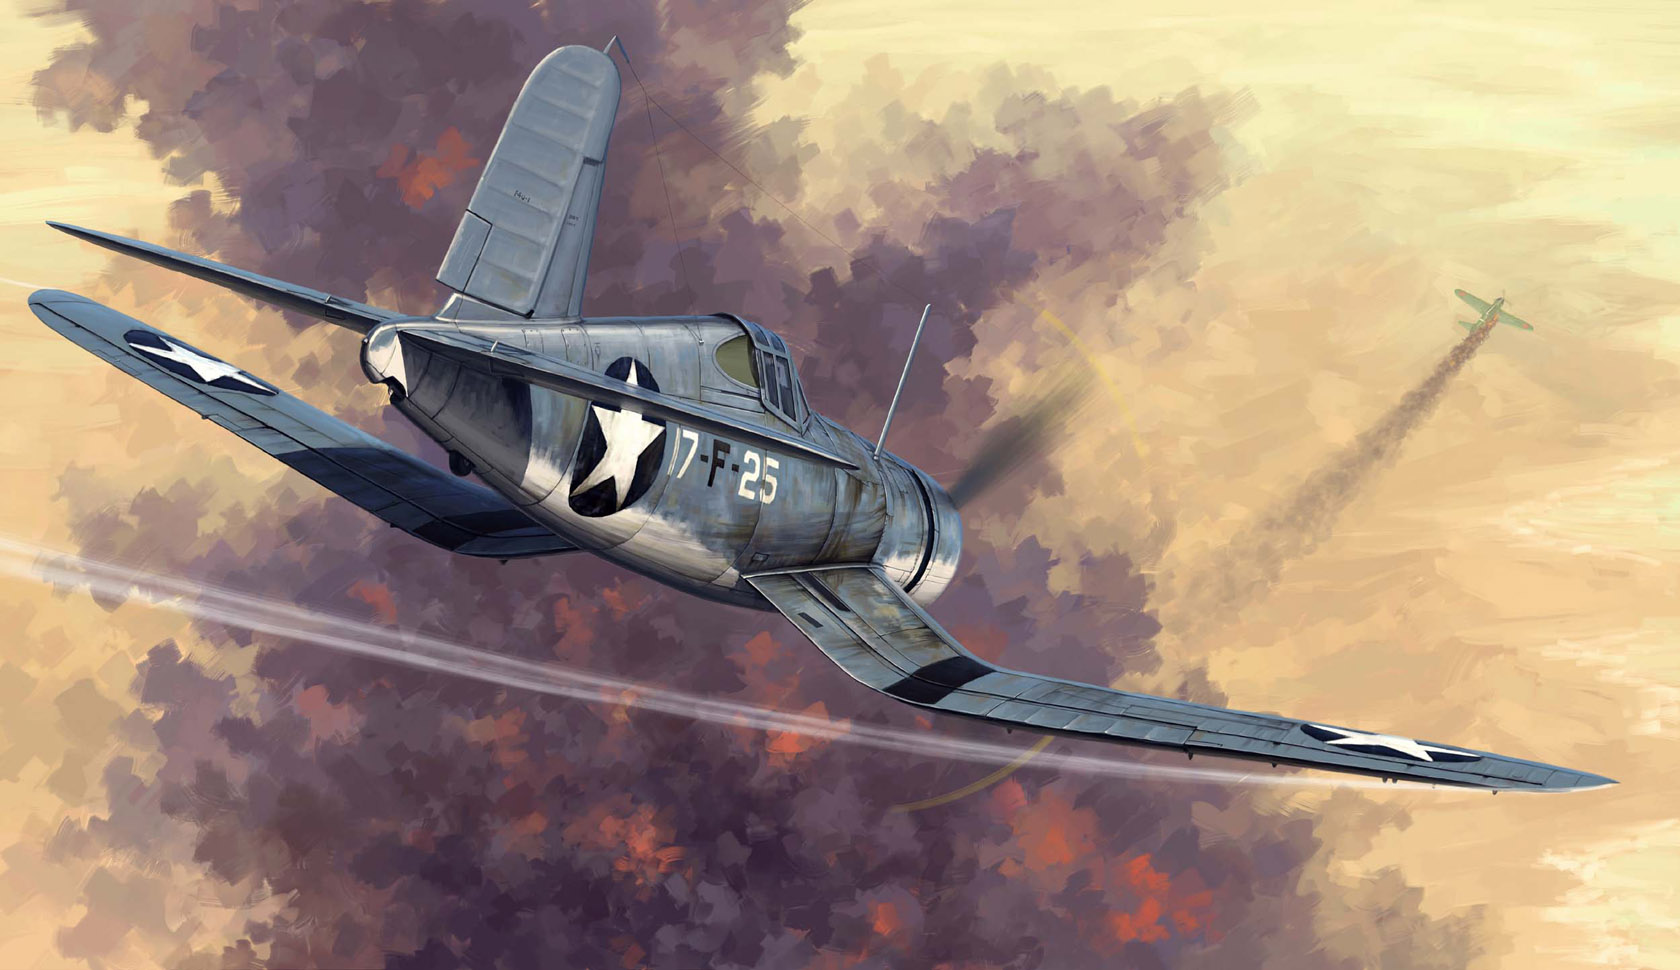 рисунок F4U-1 Corsair Early version